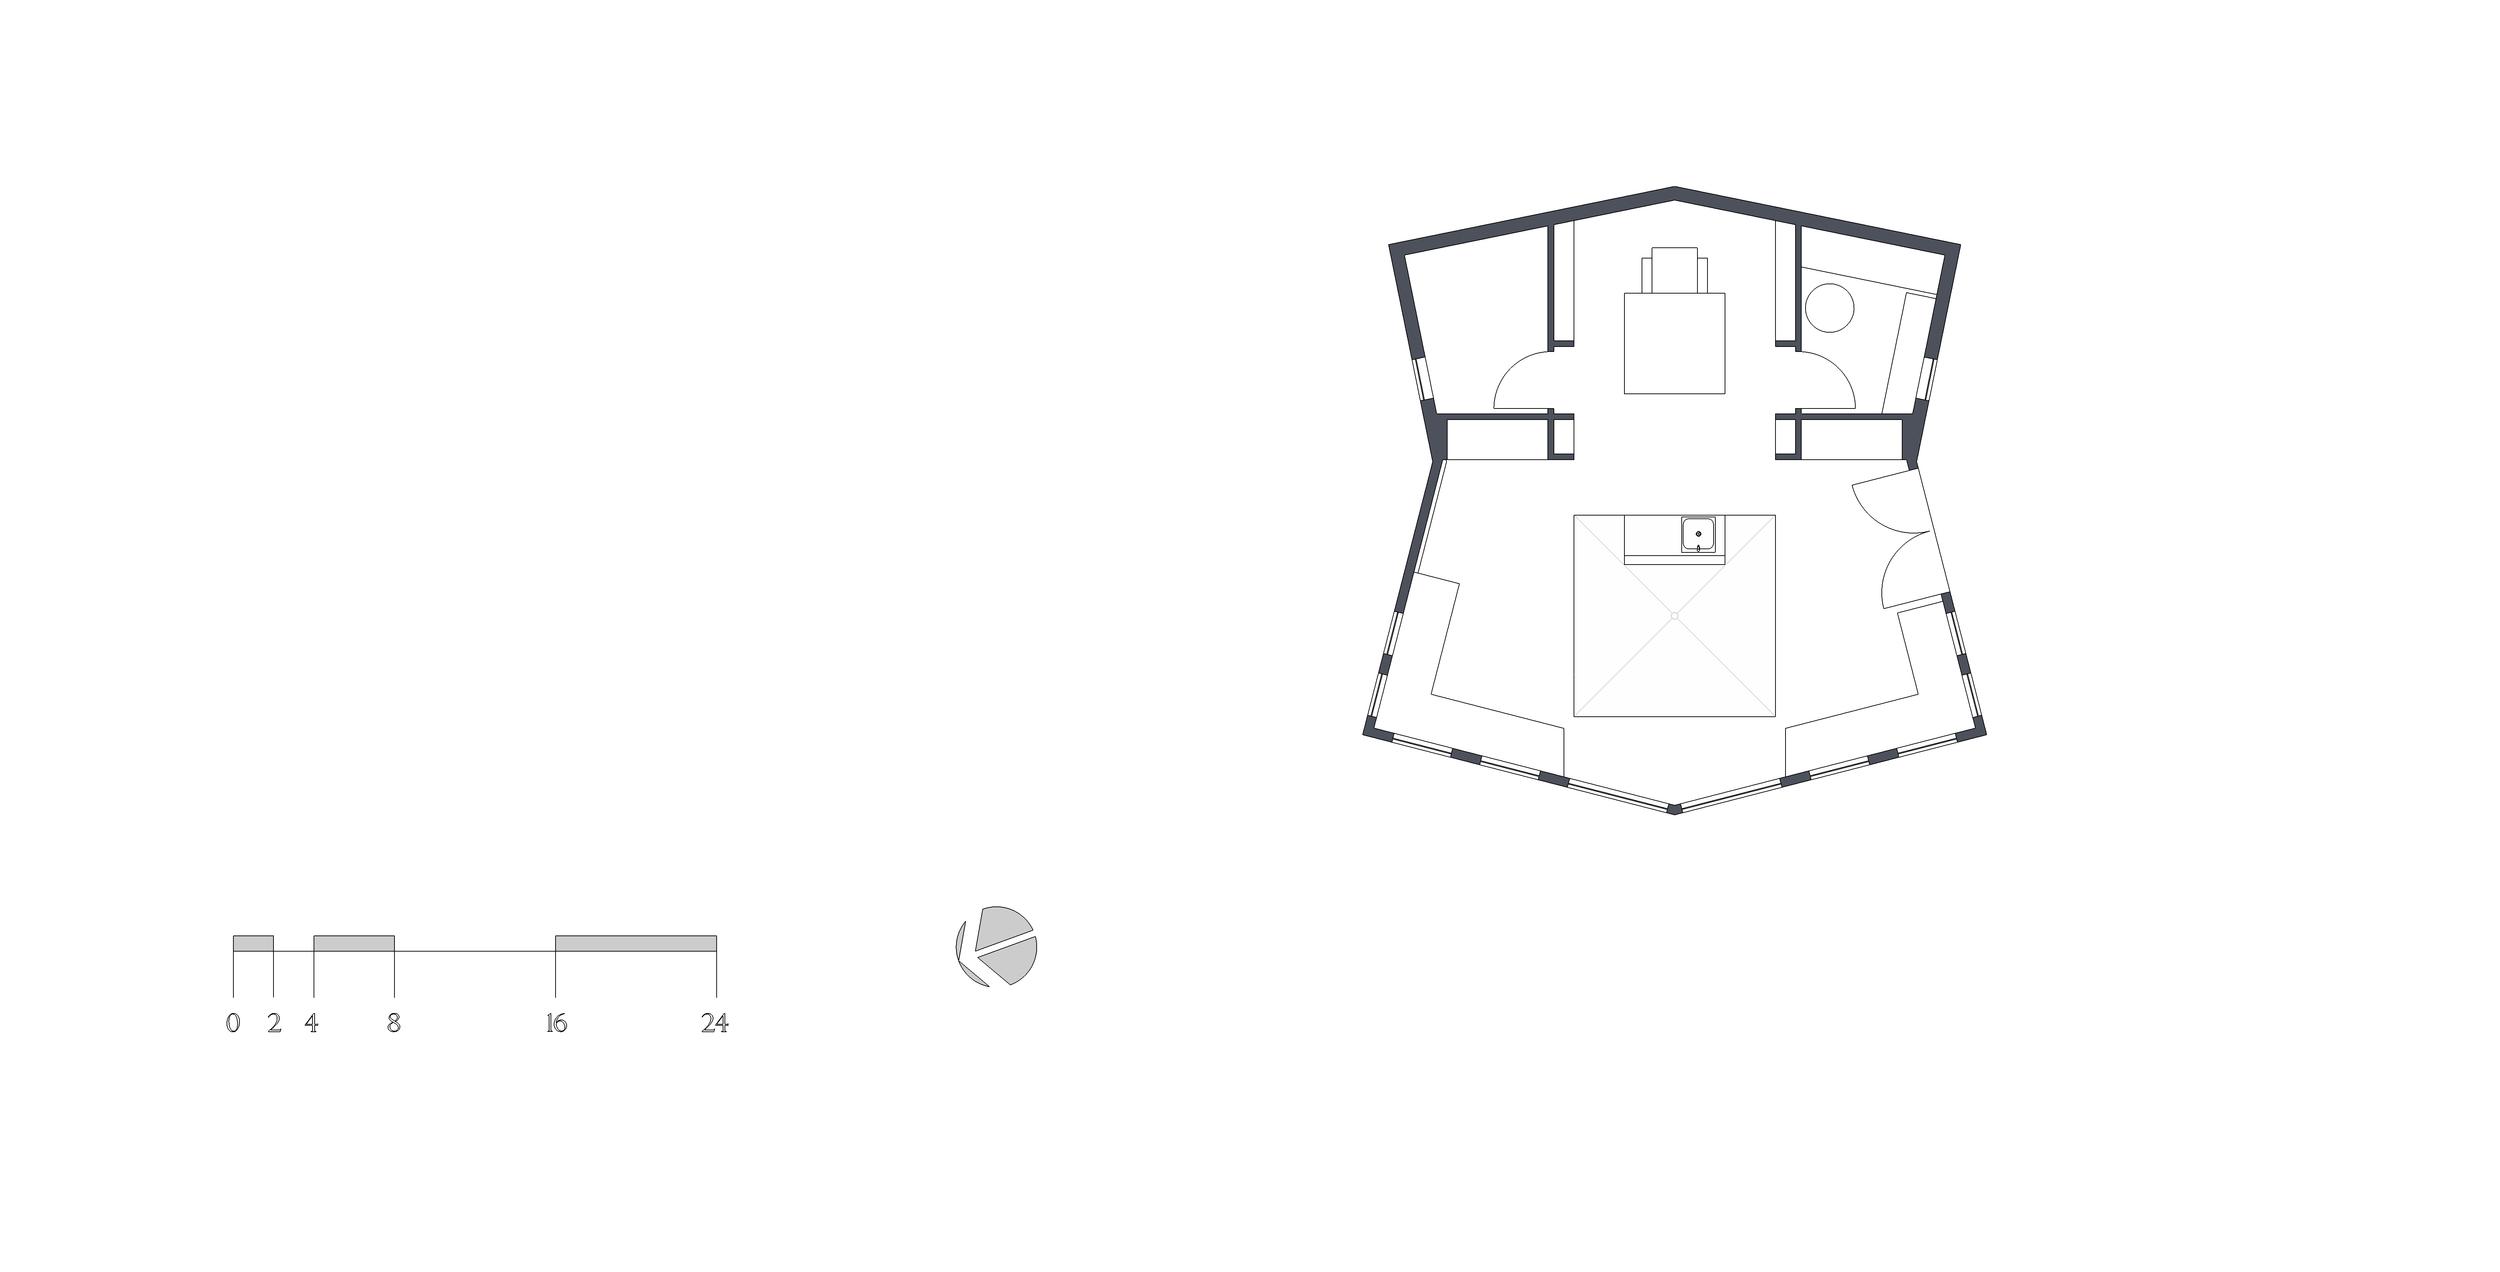 Studio Plan 1.jpg